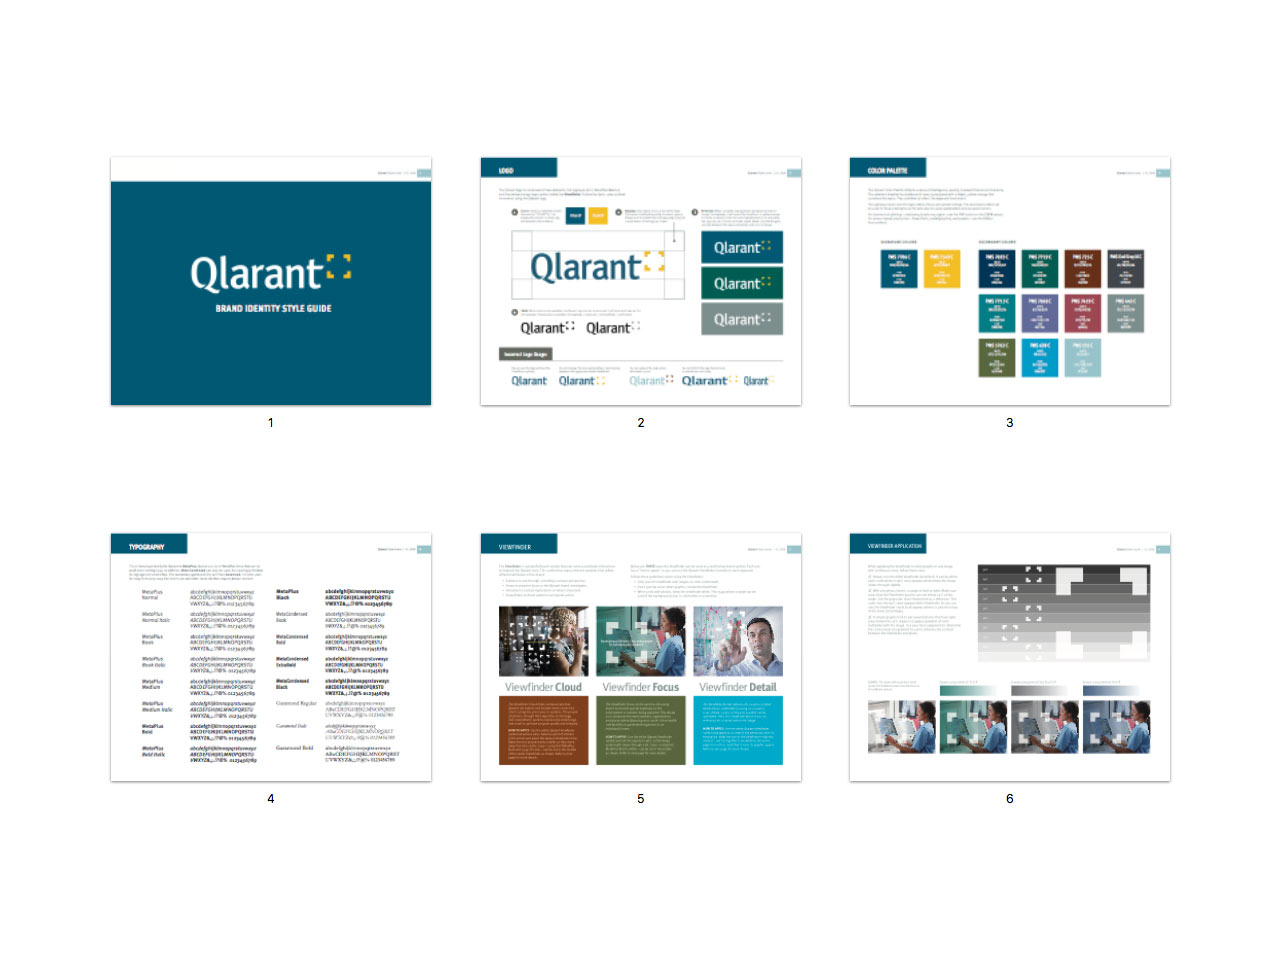 Qlarant Style Guide